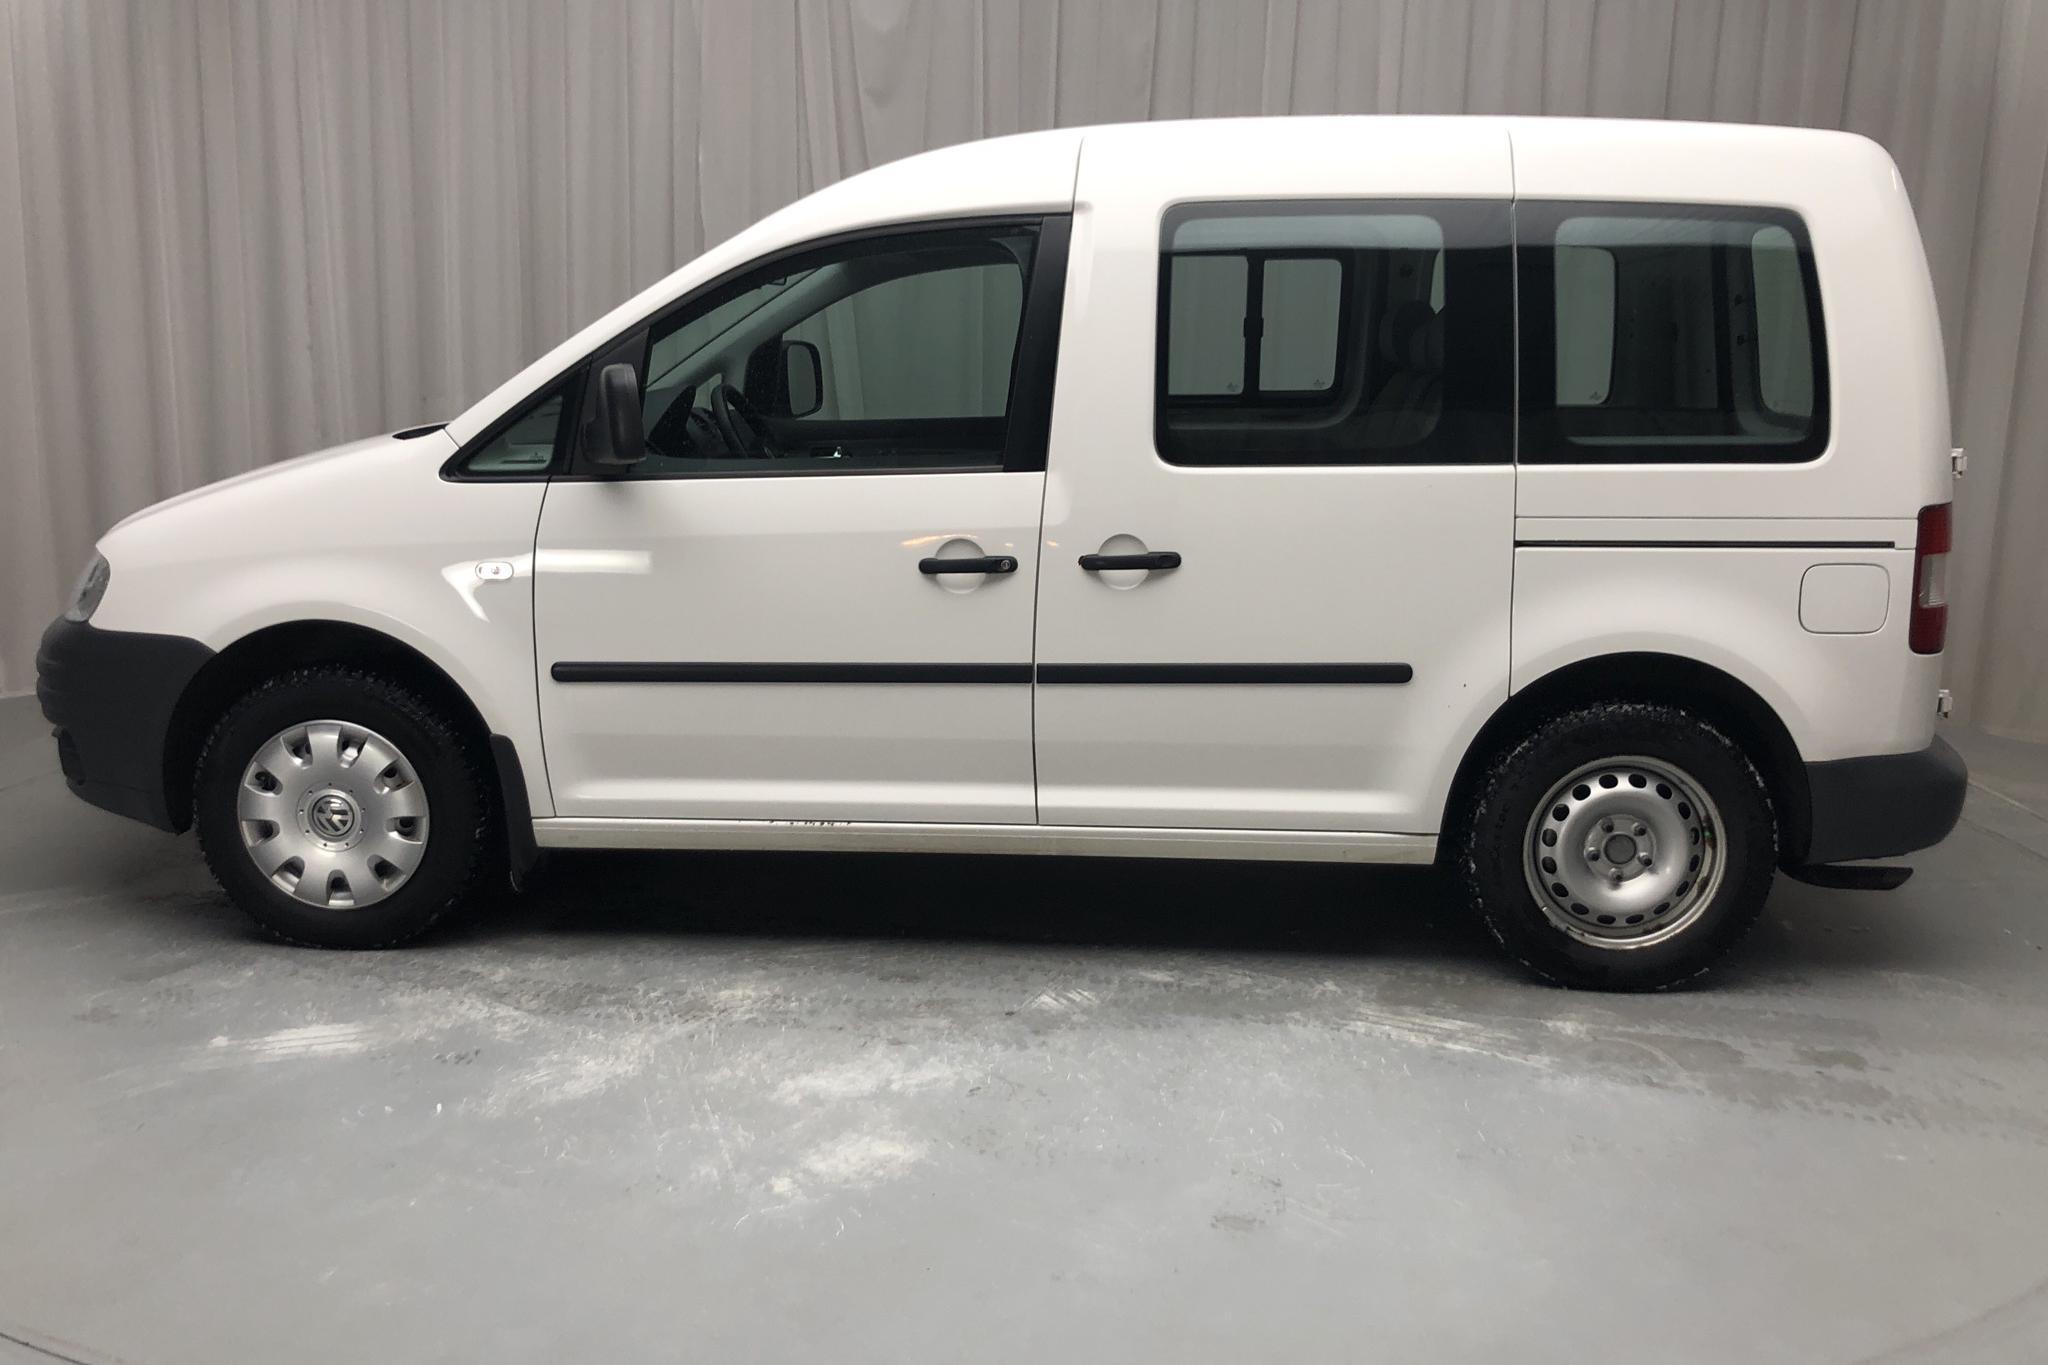 VW Caddy Life 2.0 EcoFuel (109hk) - 7 580 mil - Manuell - vit - 2008